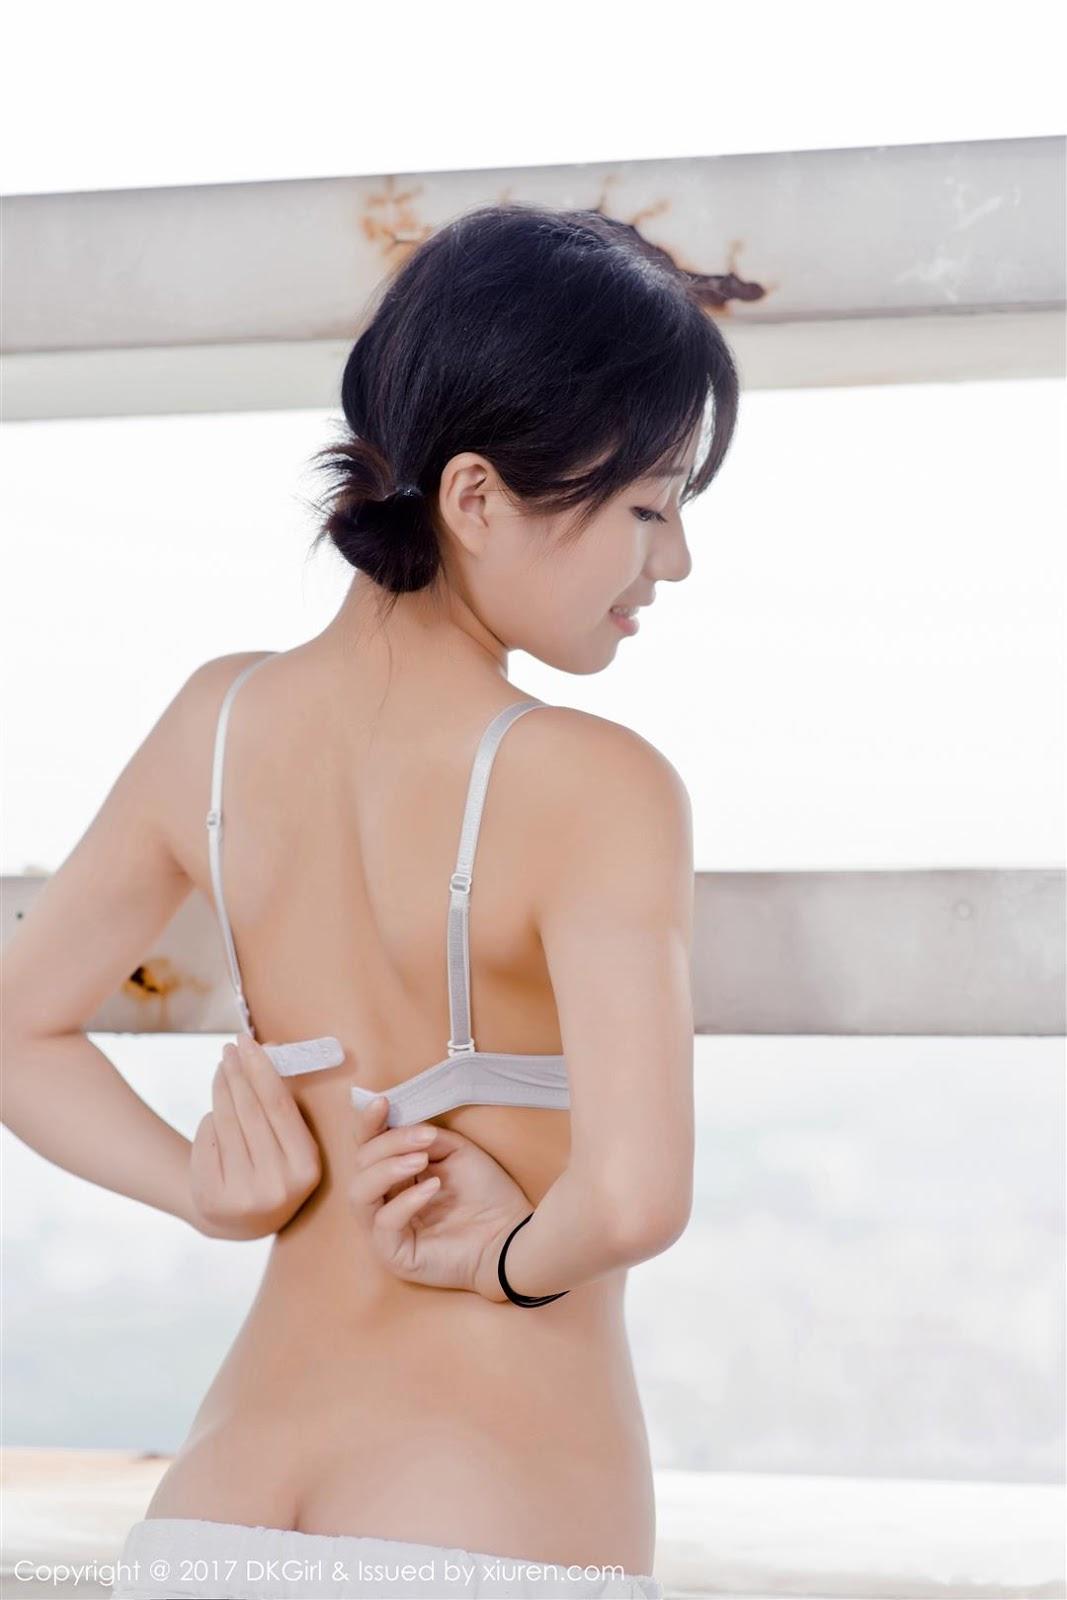 Bugil Memek badan langsing sexy